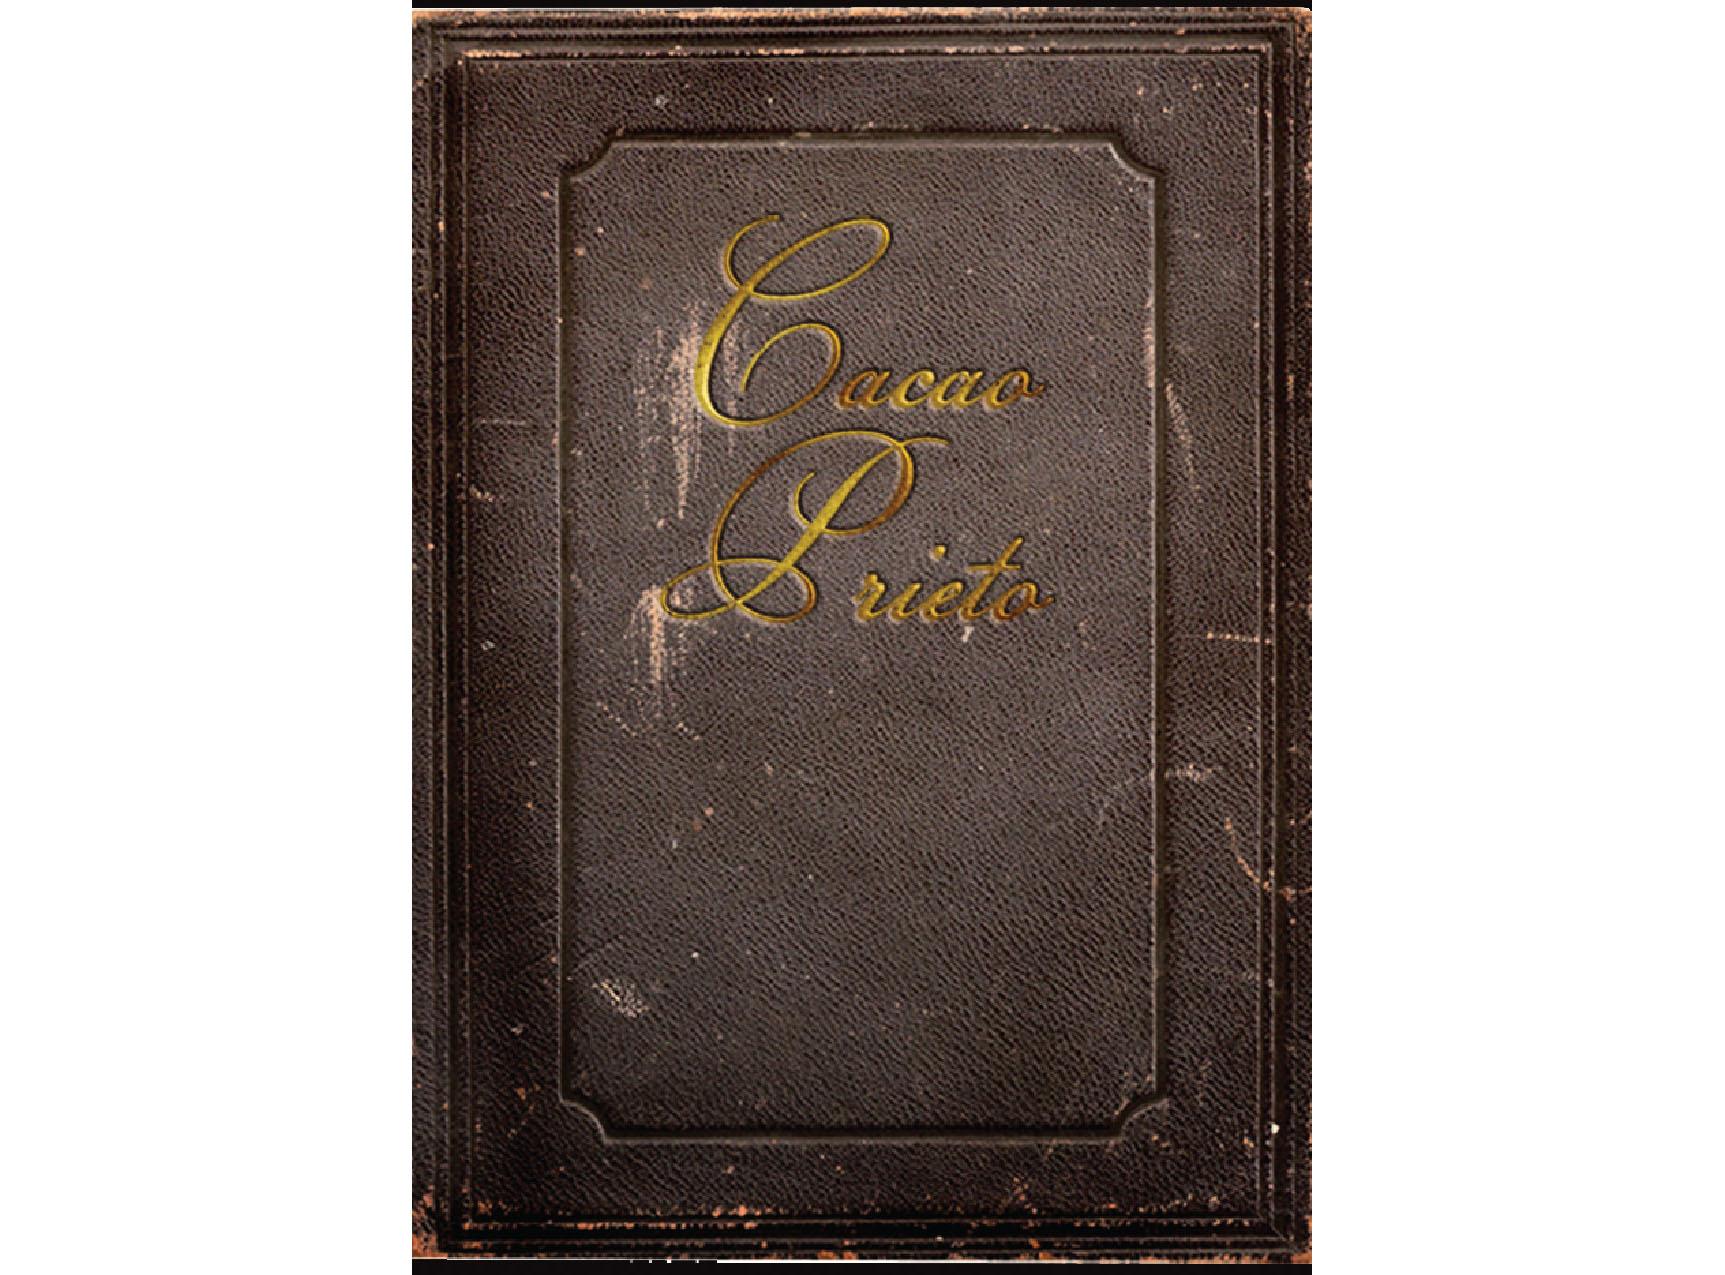 Cover website CacaoPrieto_Booklet_CS5-02 copy.JPG